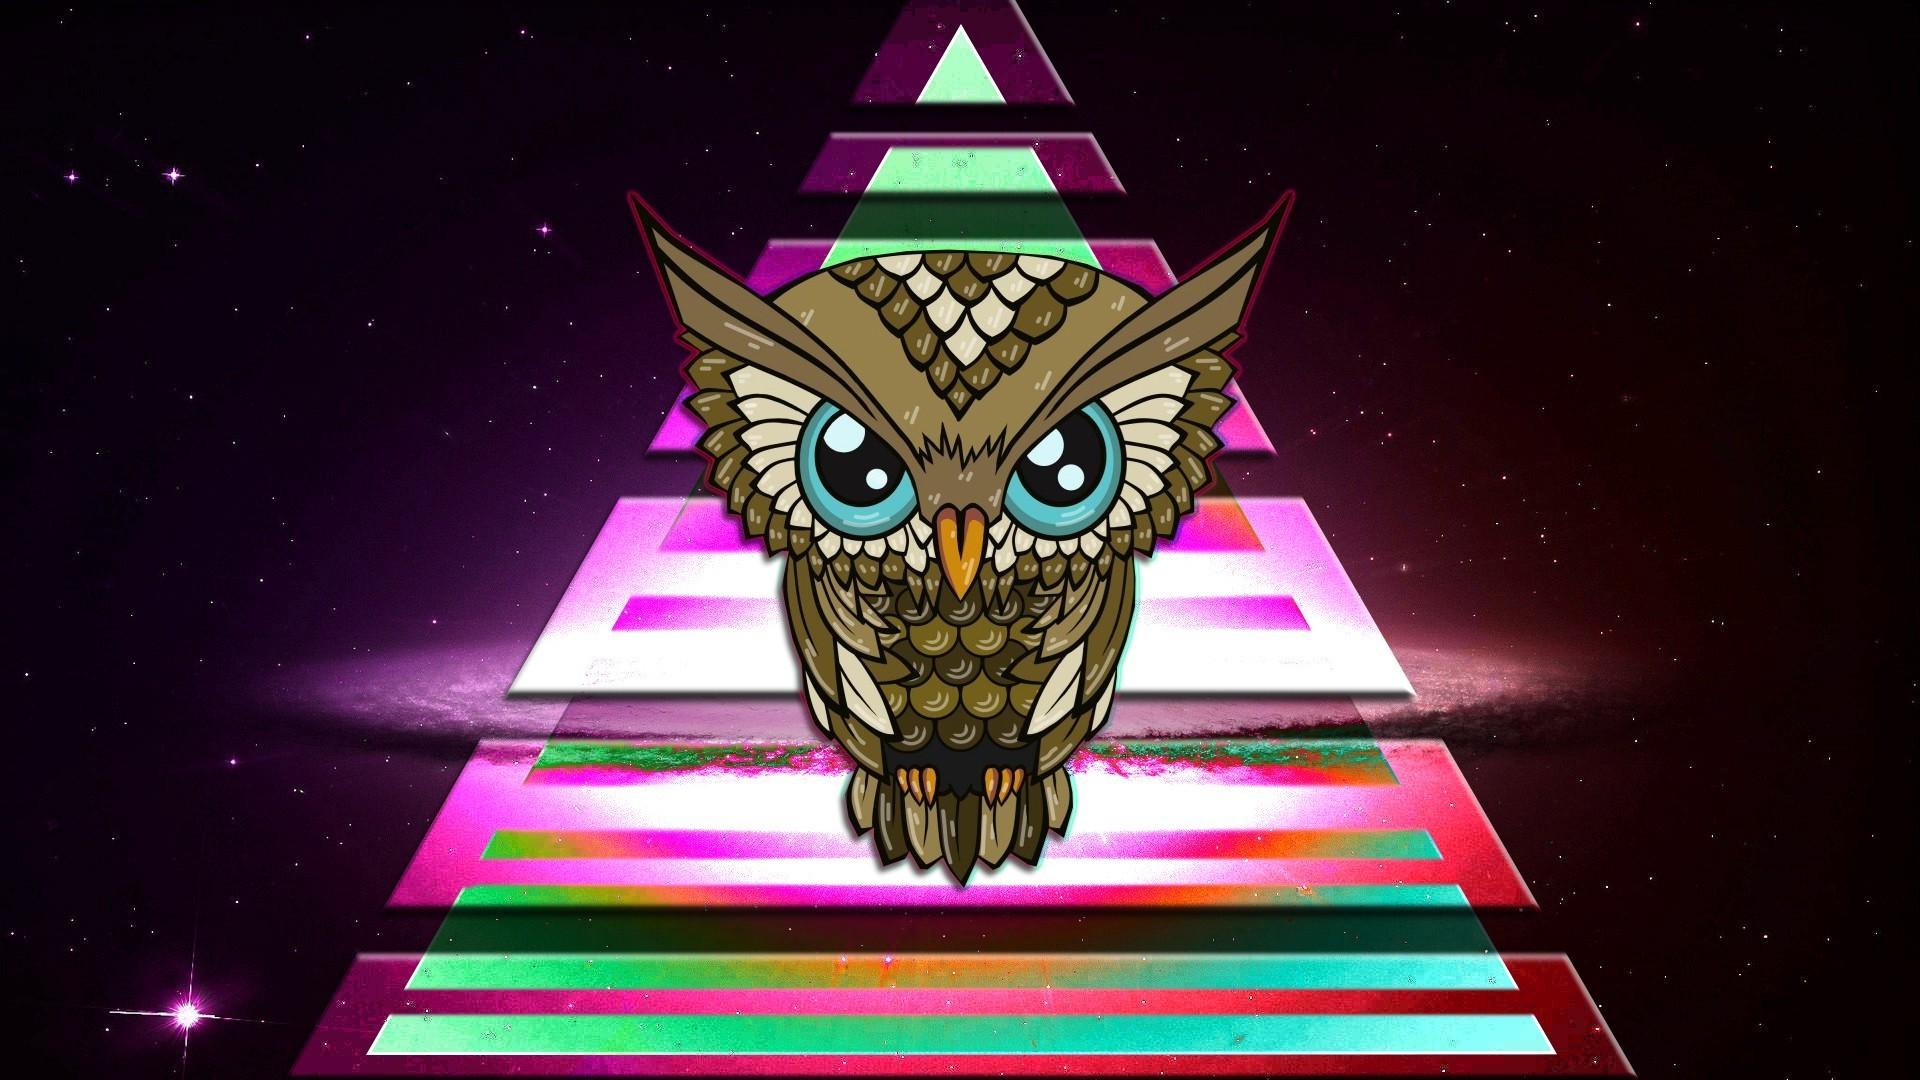 Wallpaper Gravity Falls Iphone Trippy Illuminati Wallpaper 58 Images